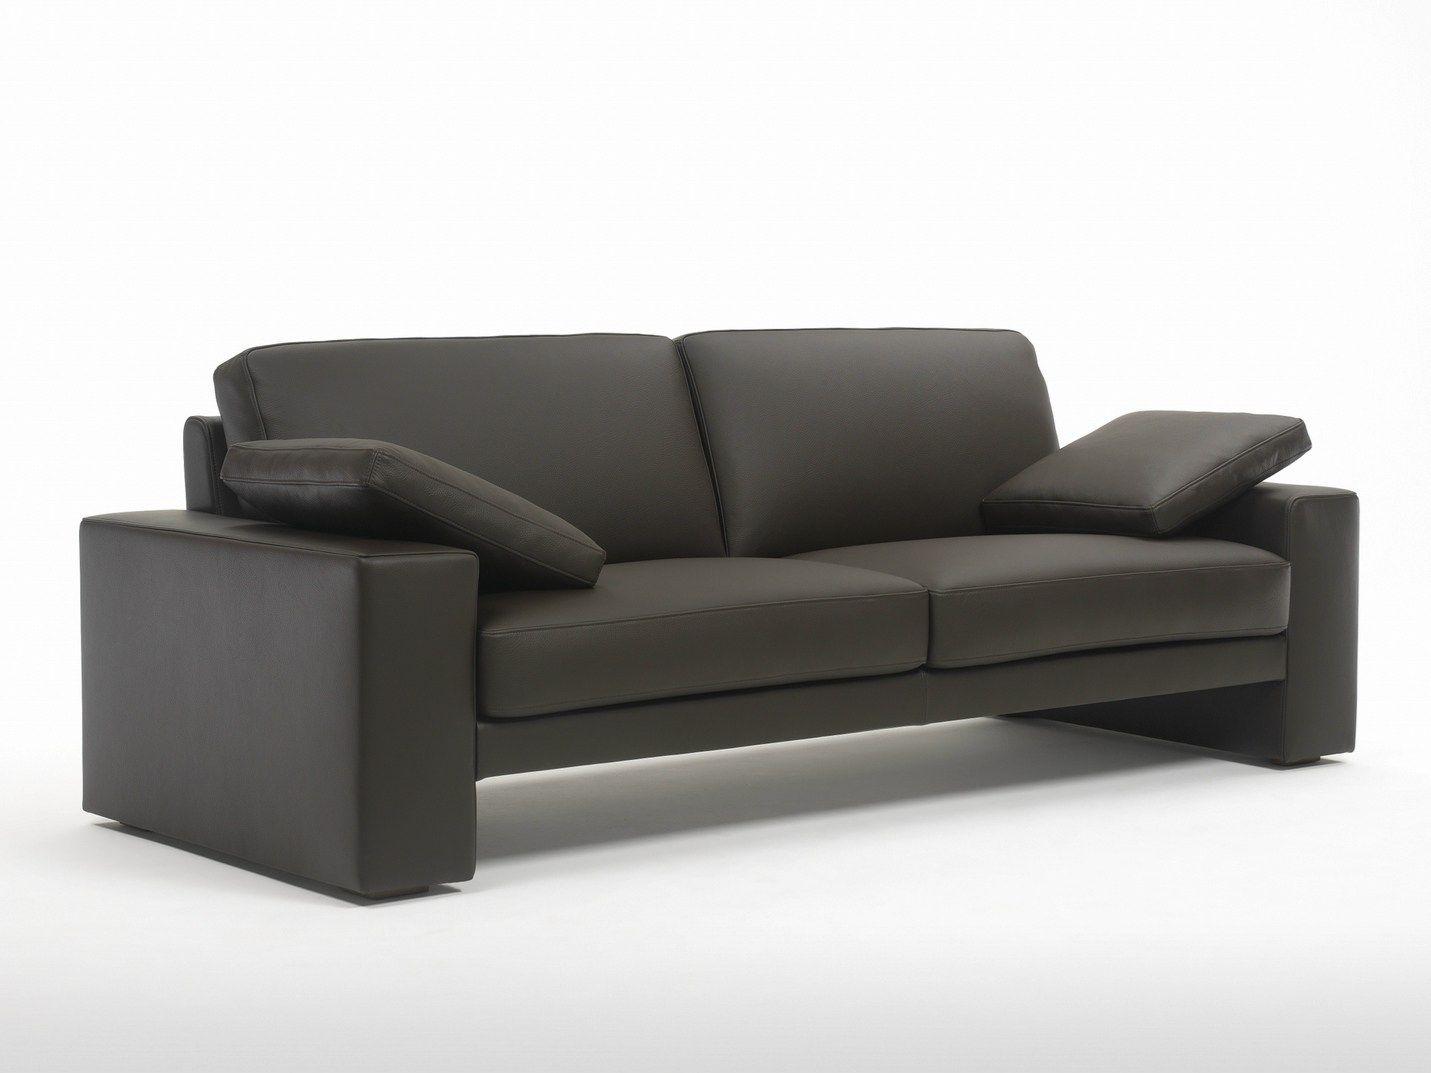 leather sofa puro by giulio marelli italia design r d studio emme. Black Bedroom Furniture Sets. Home Design Ideas